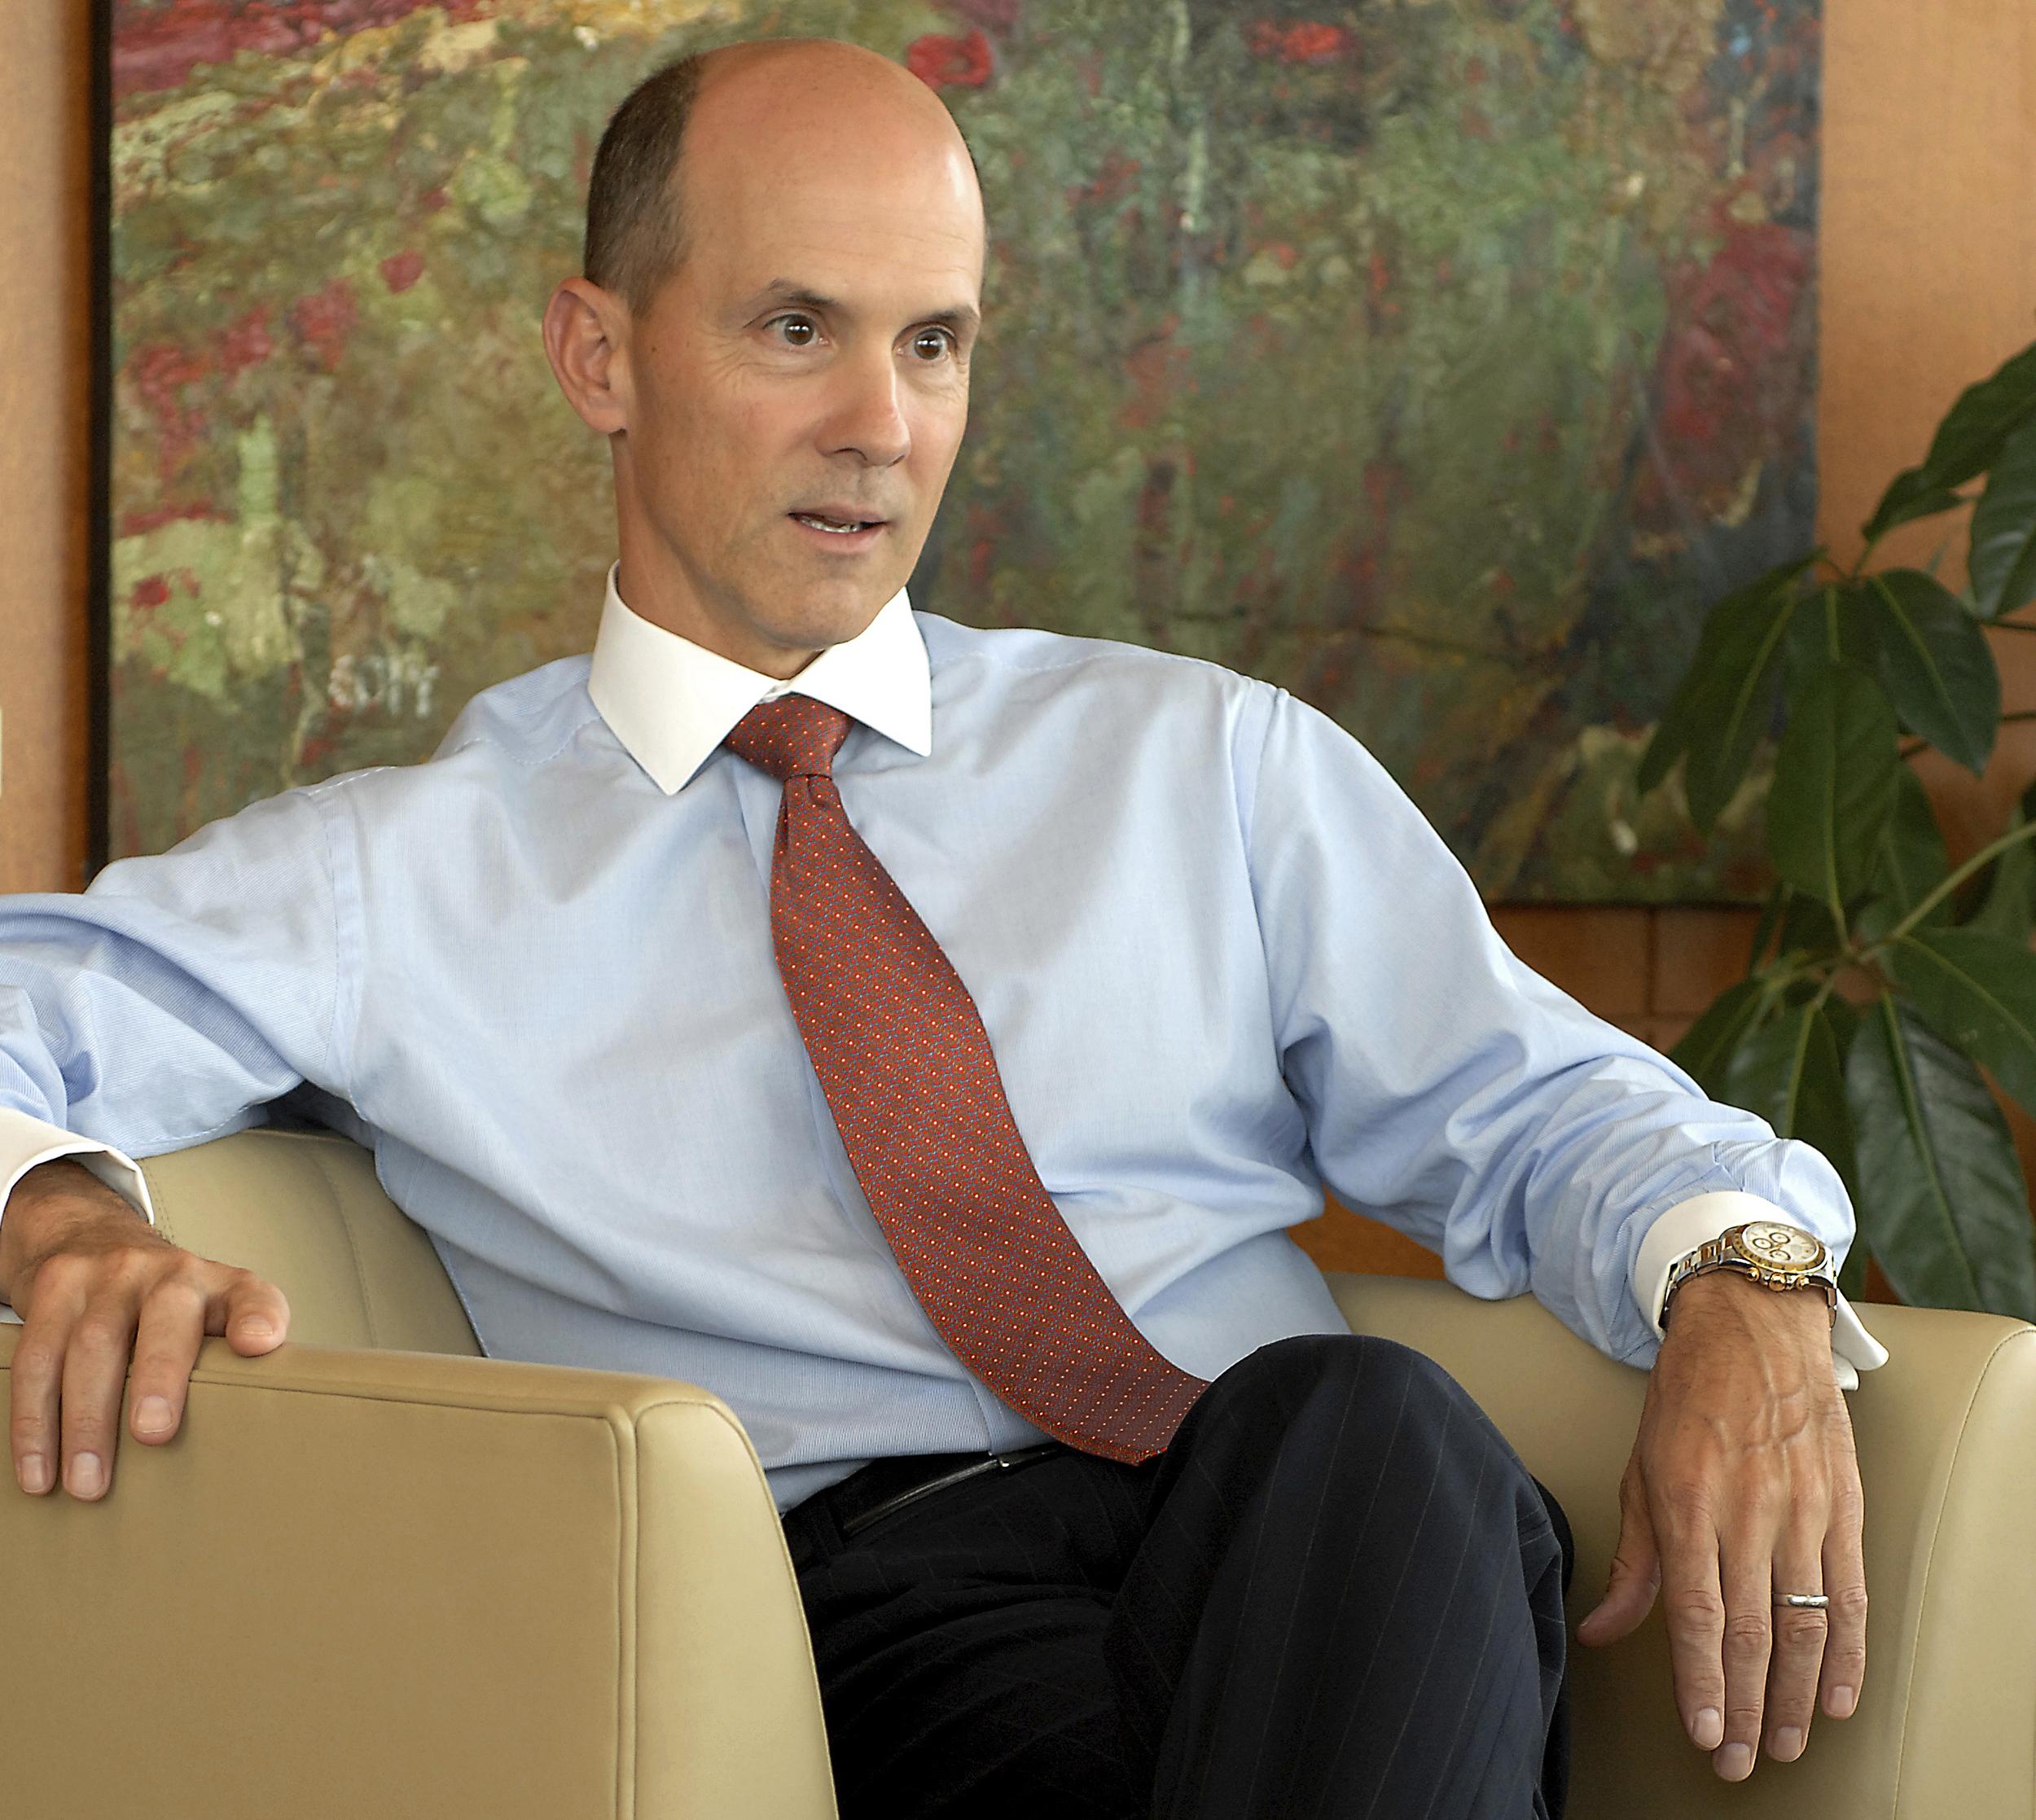 Image: Equifax CEO Richard Smith